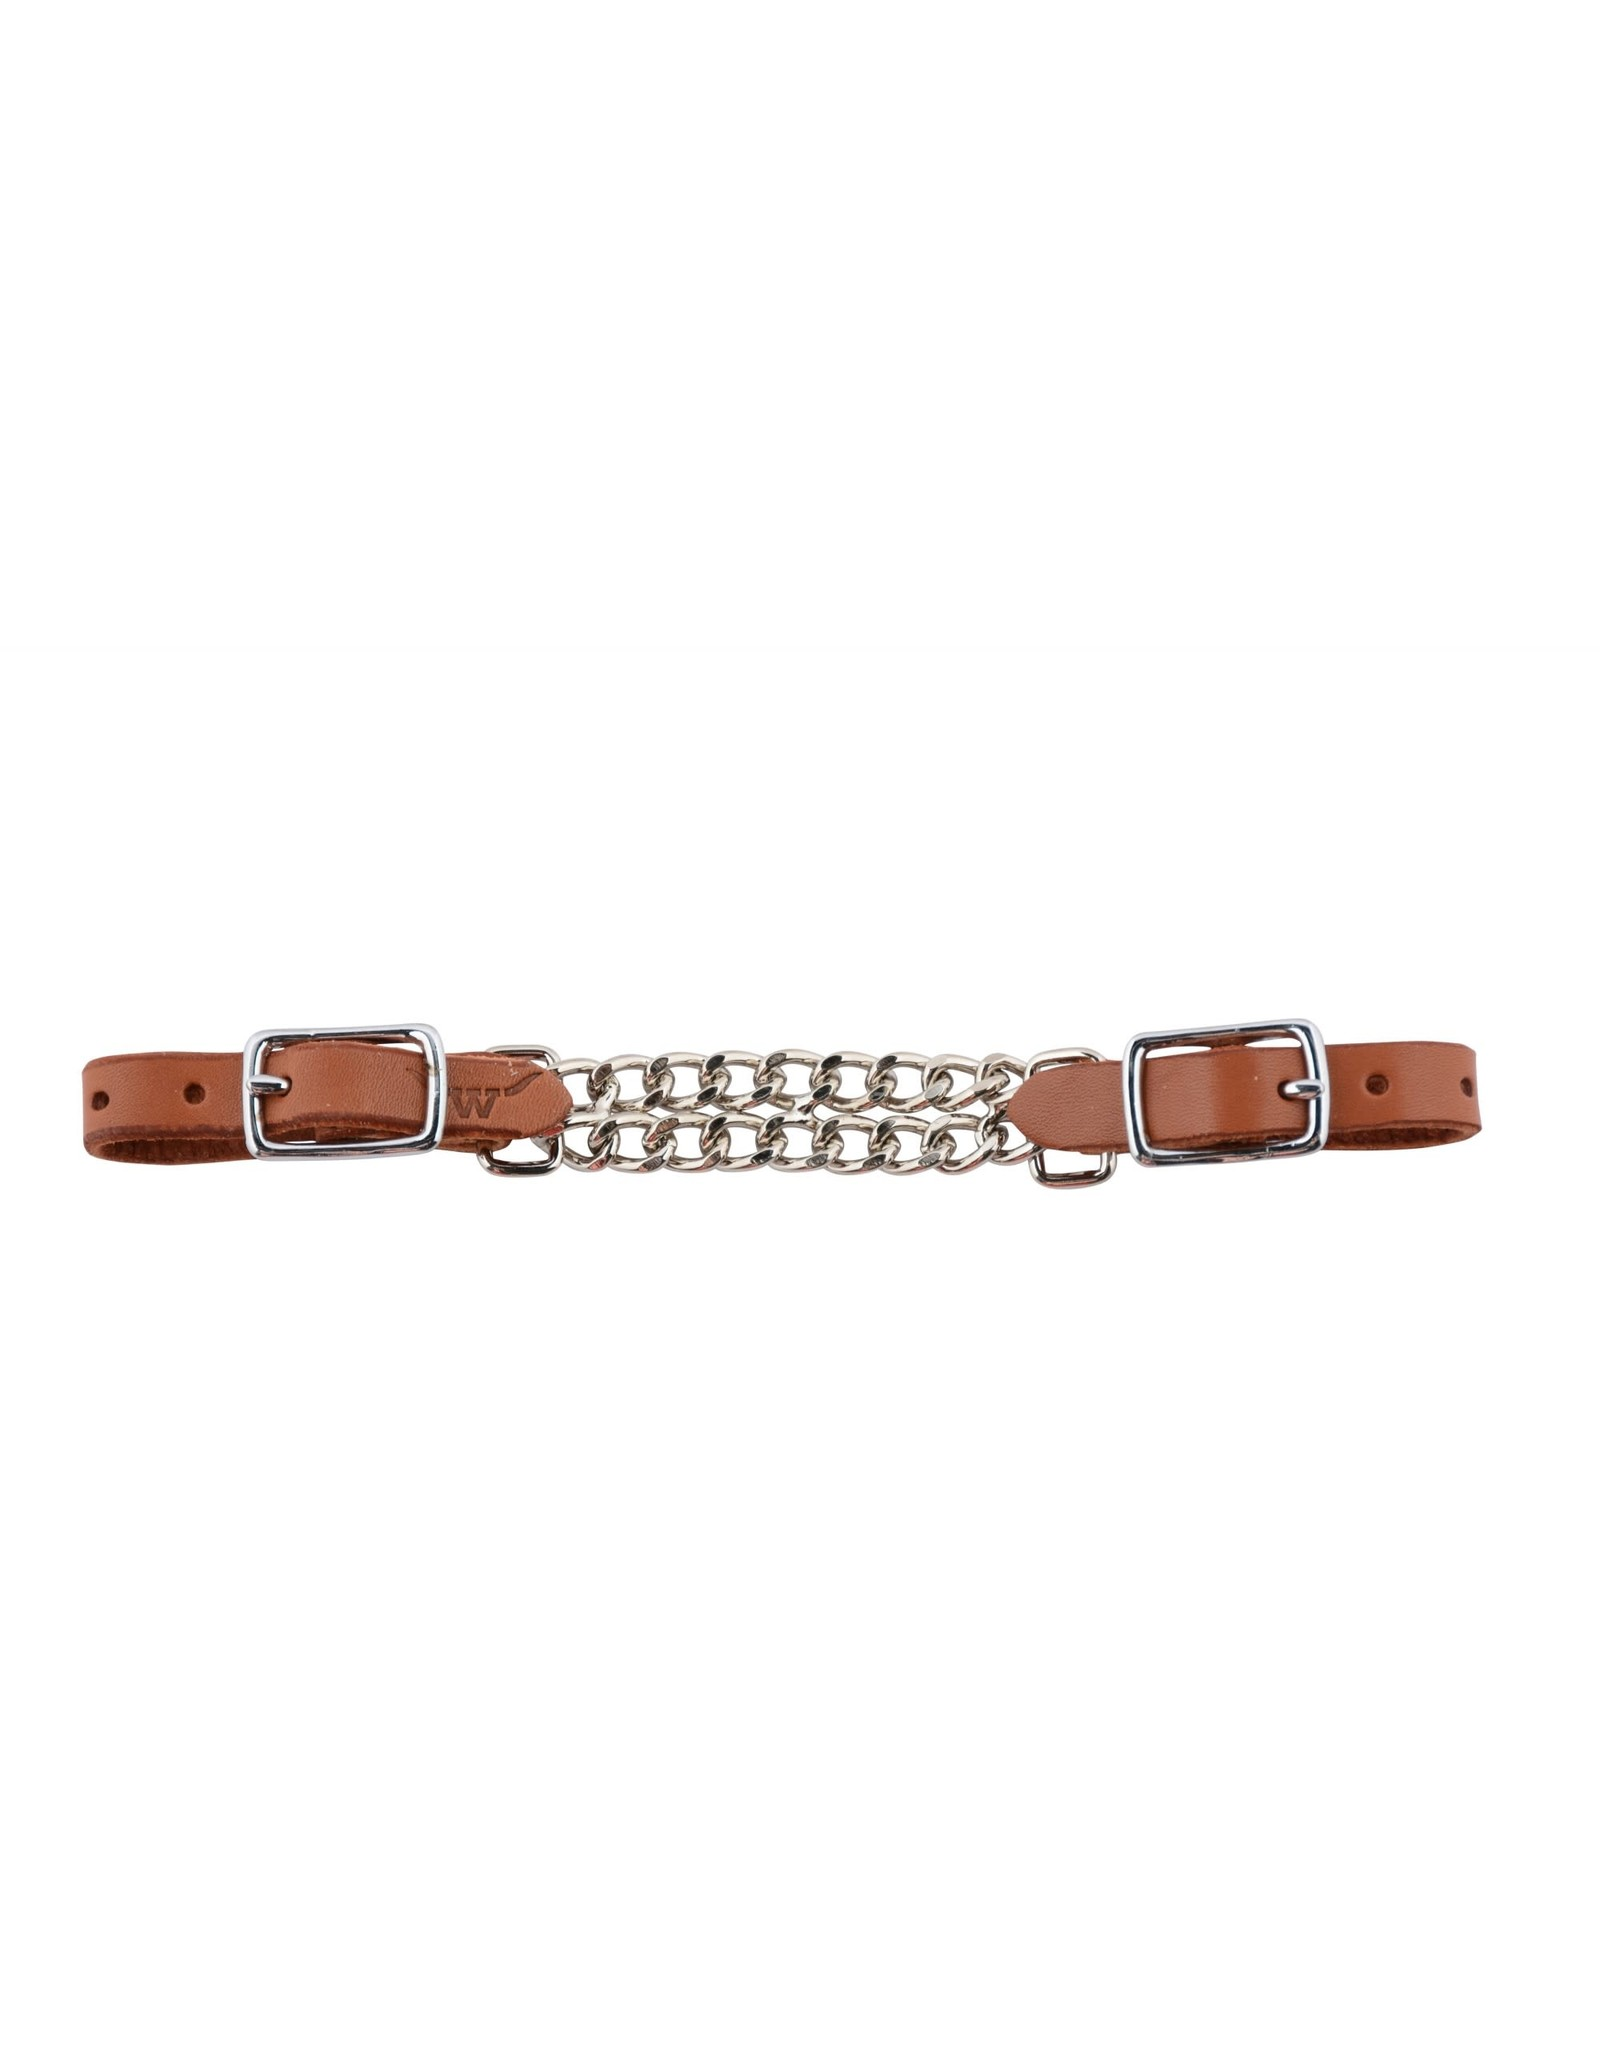 Western Rawhide Double Curb Chain